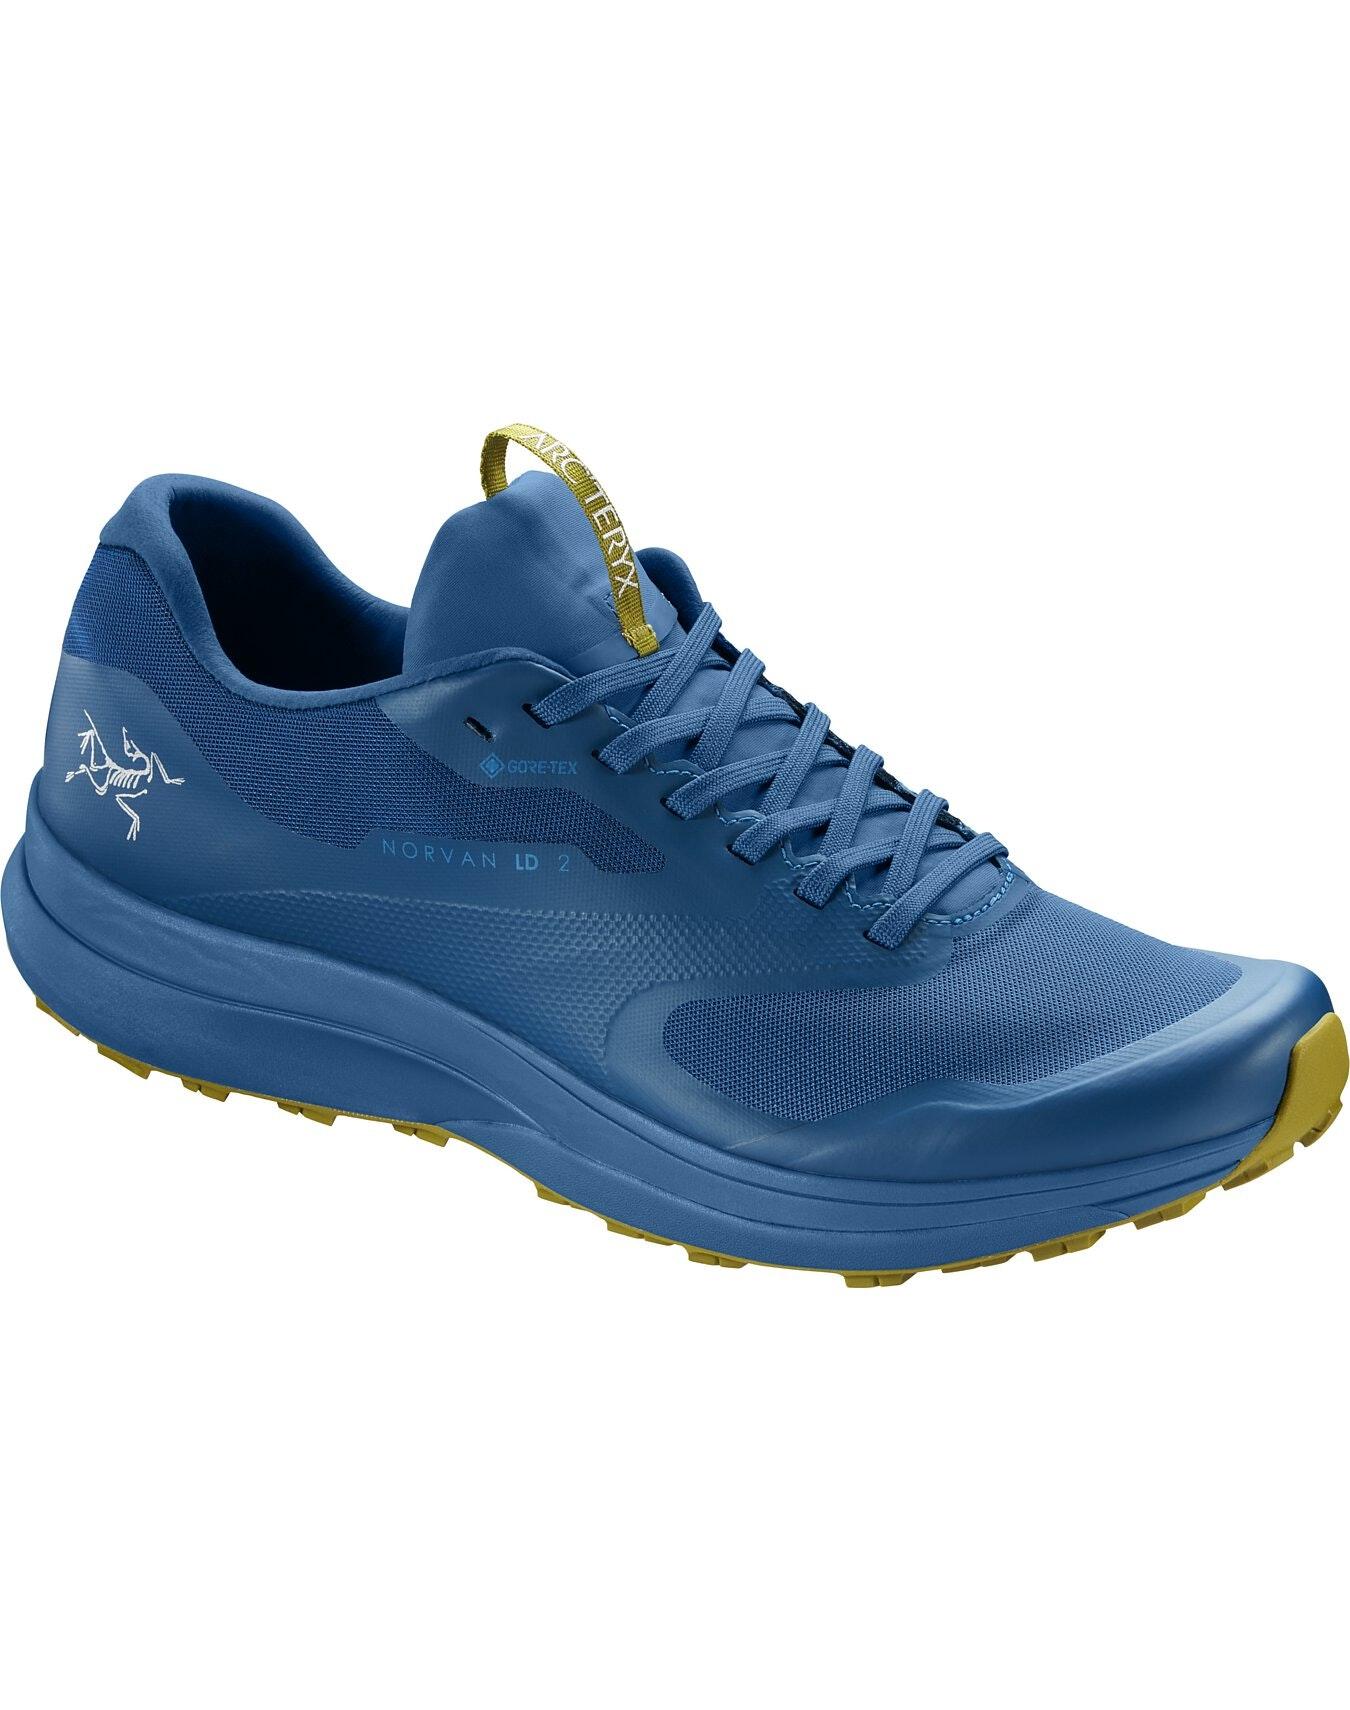 Norvan LD 2 GTX Shoe Nomad/Elytron